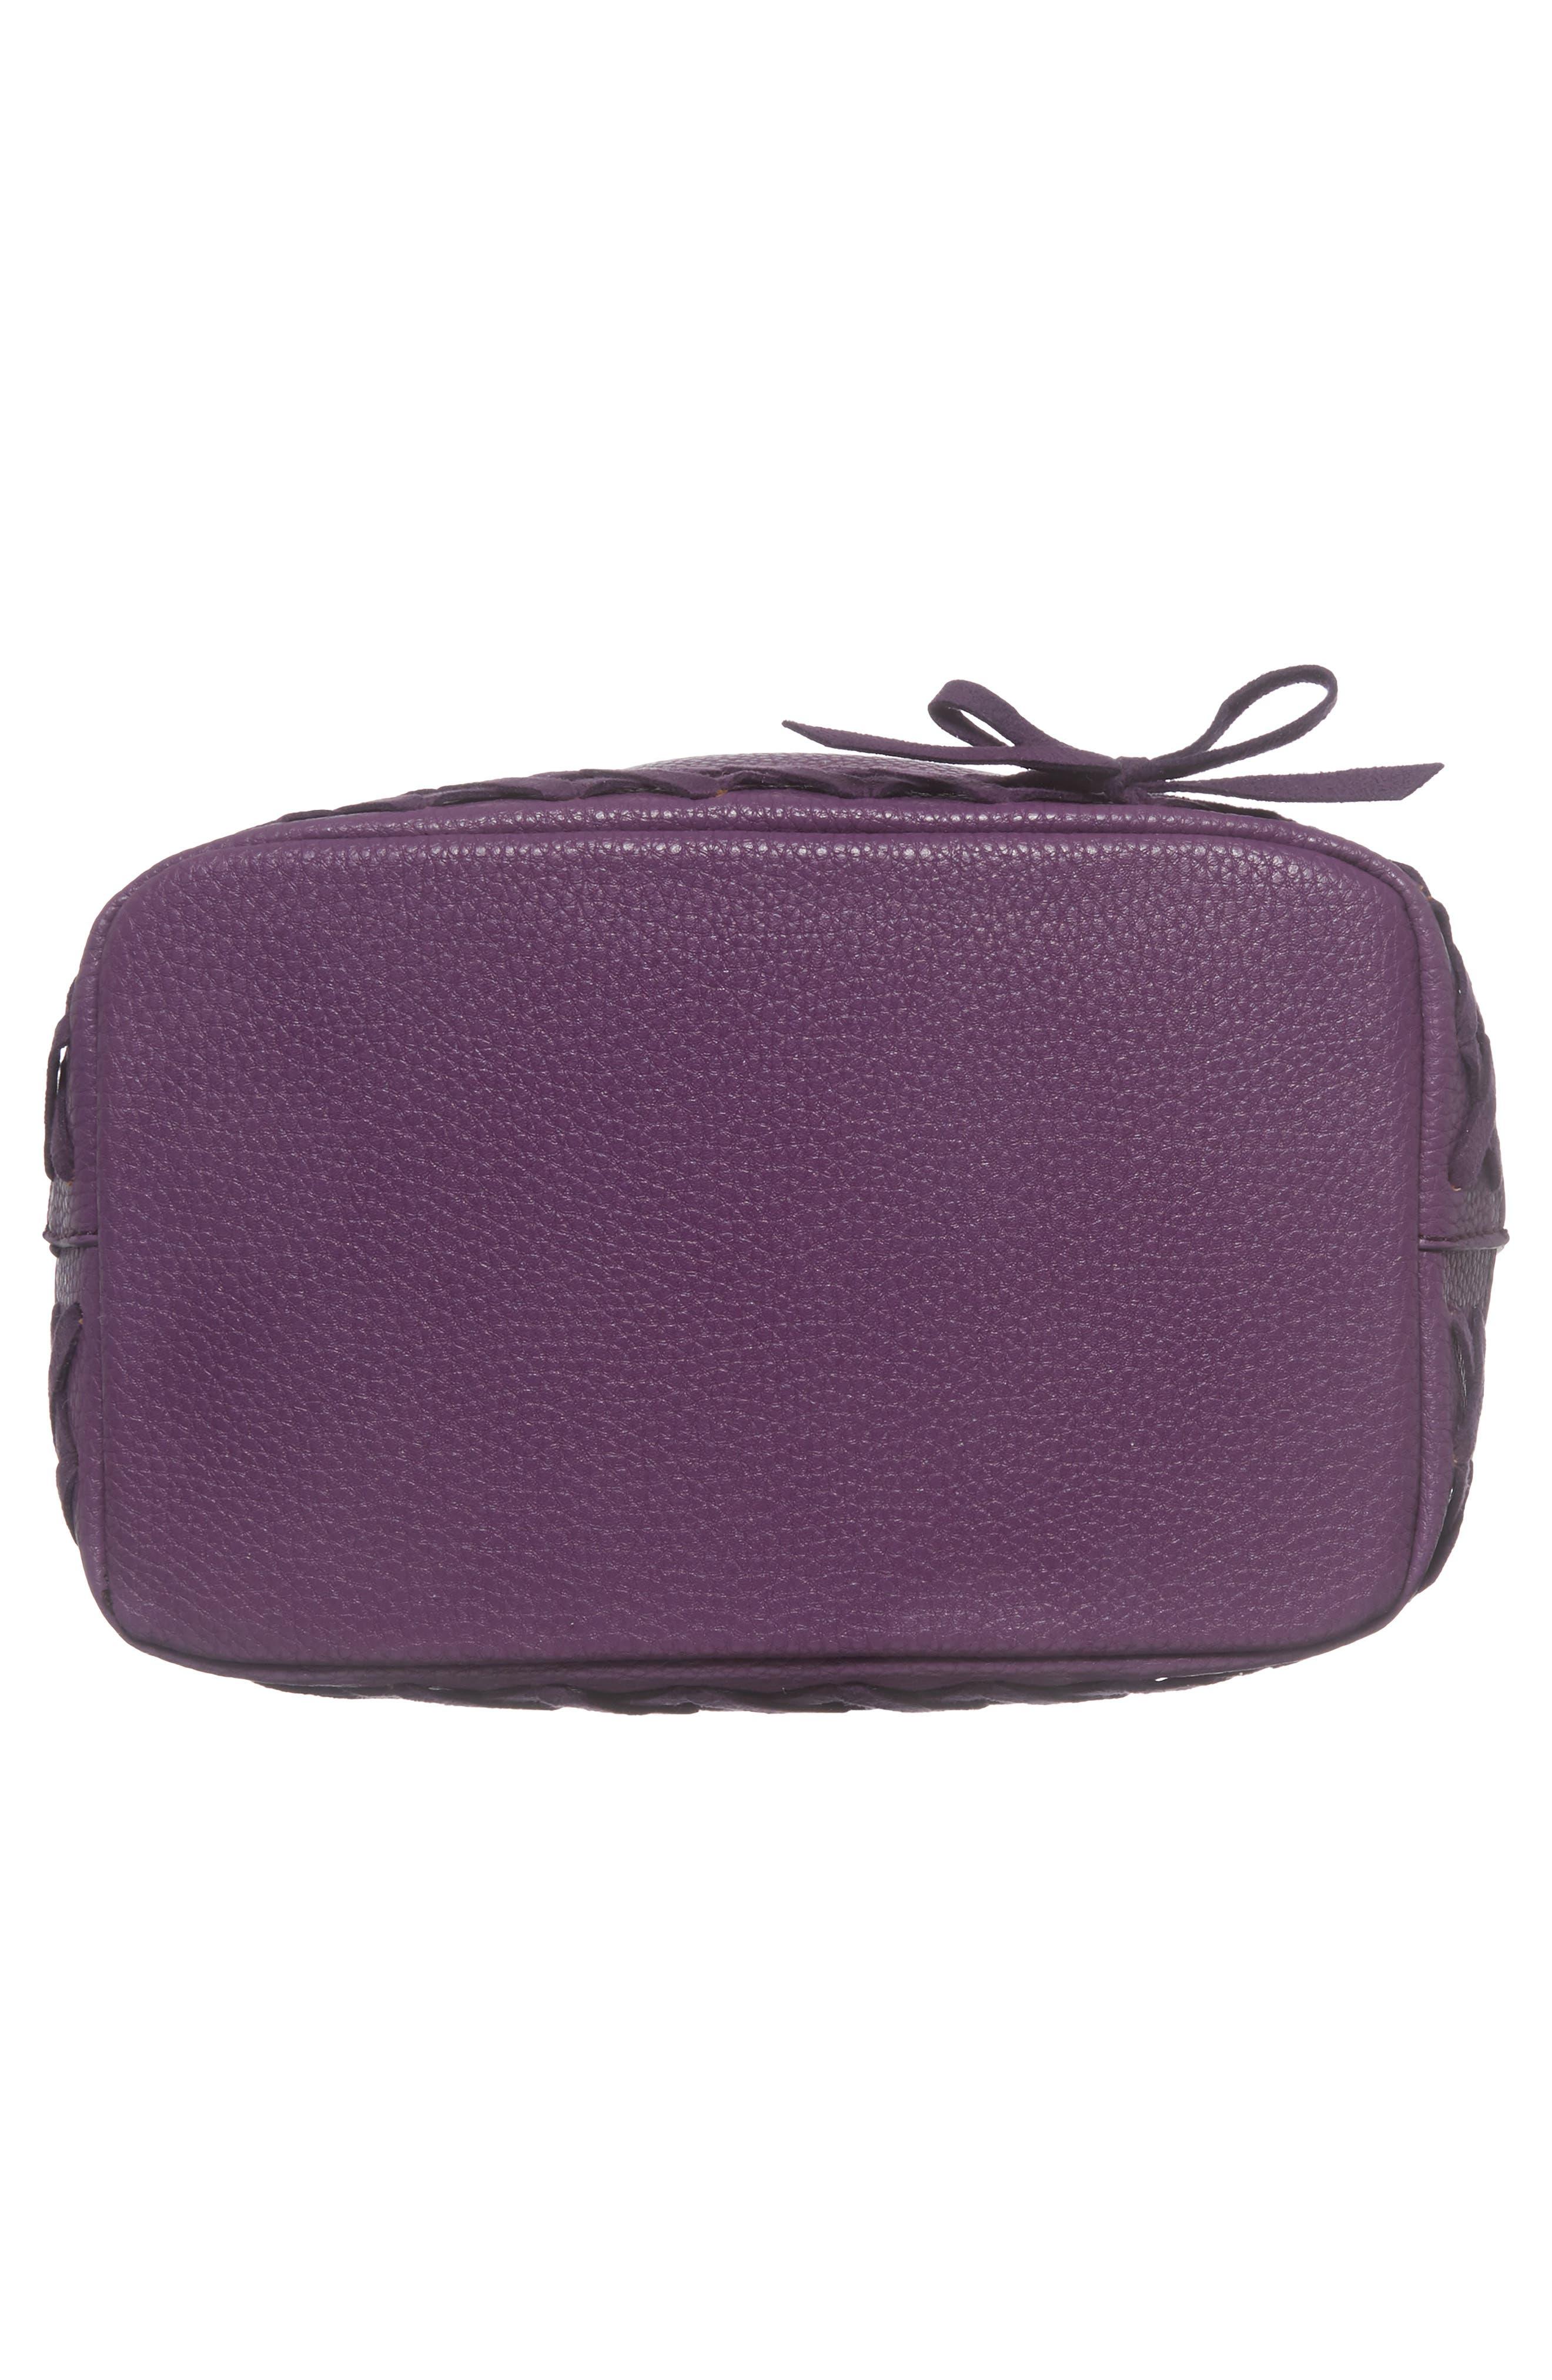 Veronica Faux Leather Bucket Bag,                             Alternate thumbnail 12, color,